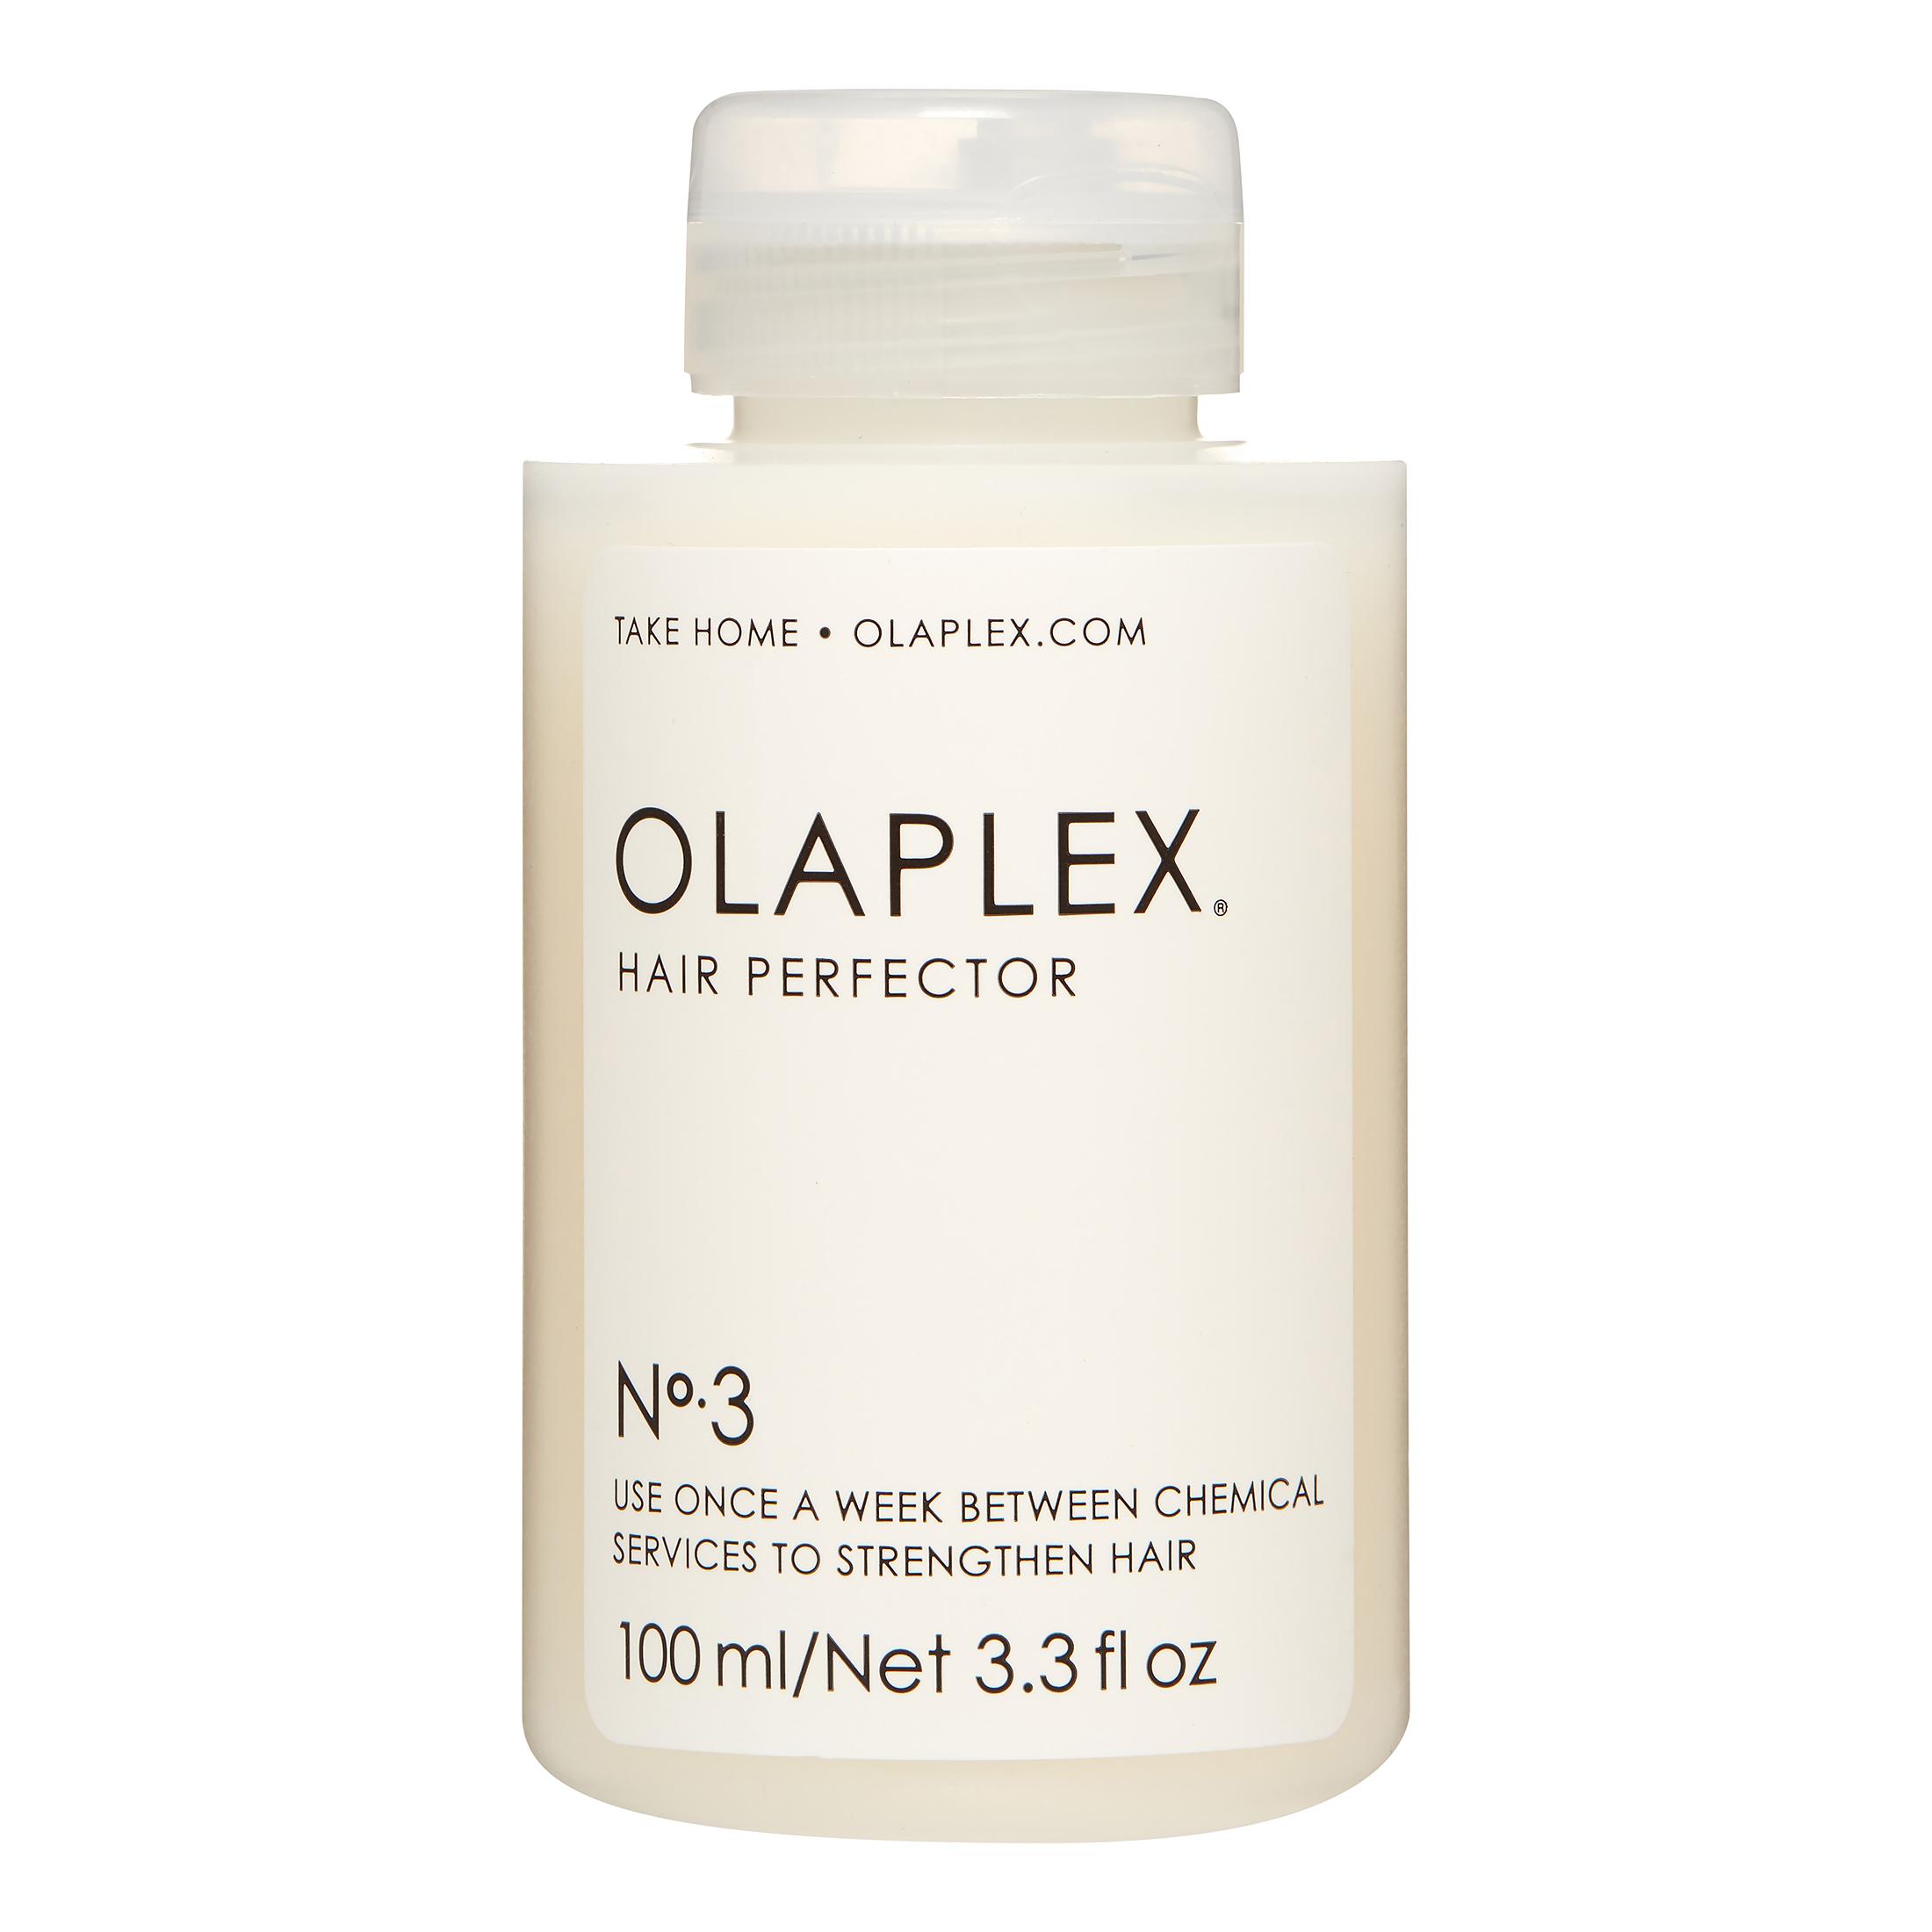 Olaplex Hair Perfector No.3, 3.3 Oz  Walmart.com